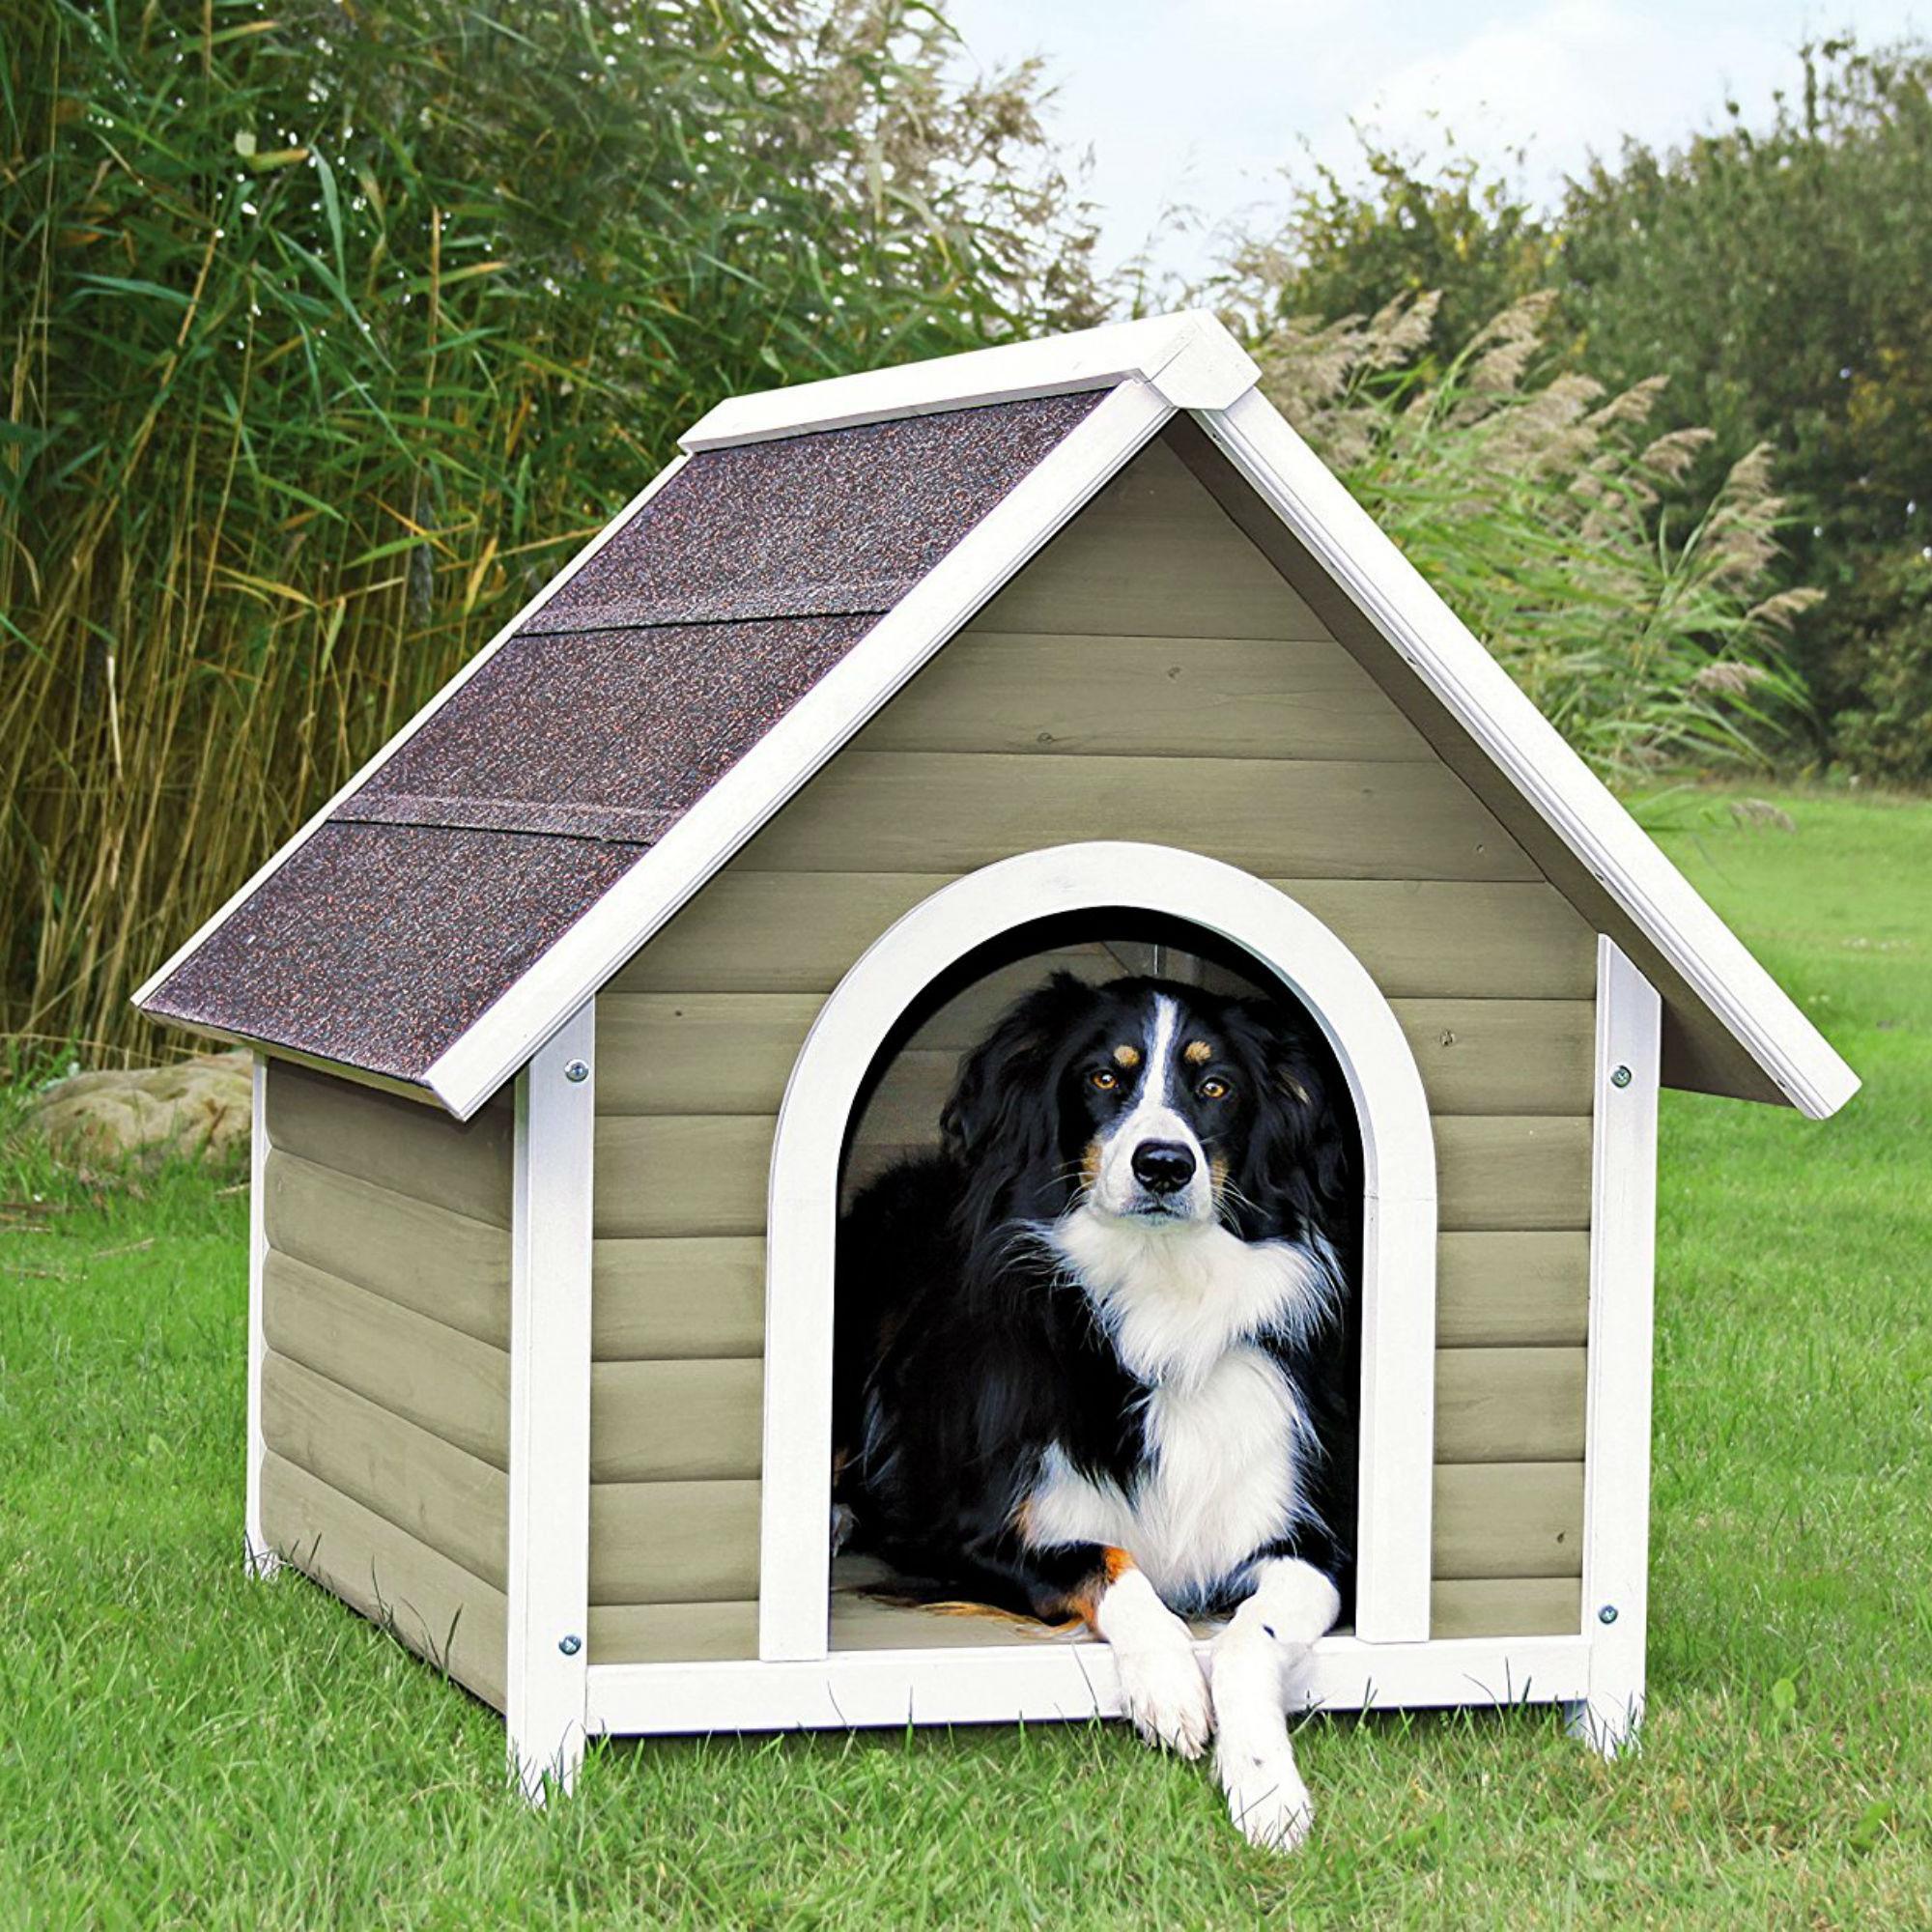 Trixie Nantucket Cottage Dog House - Gray